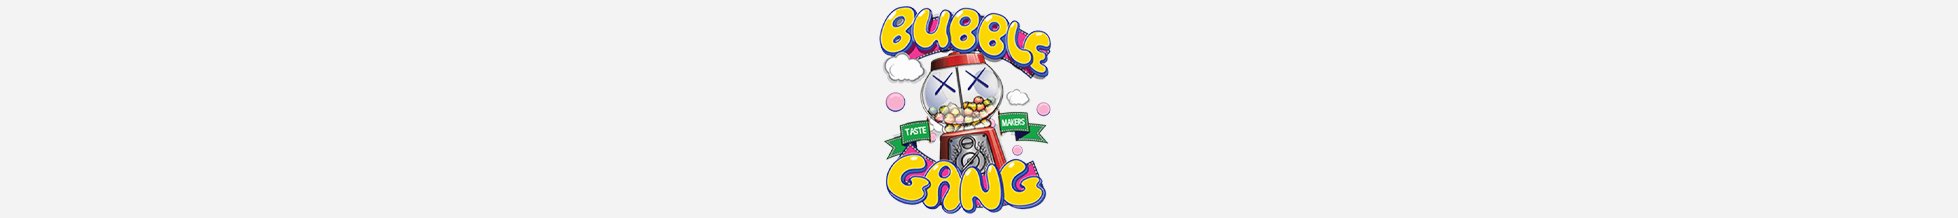 bubble-gang-category.jpg